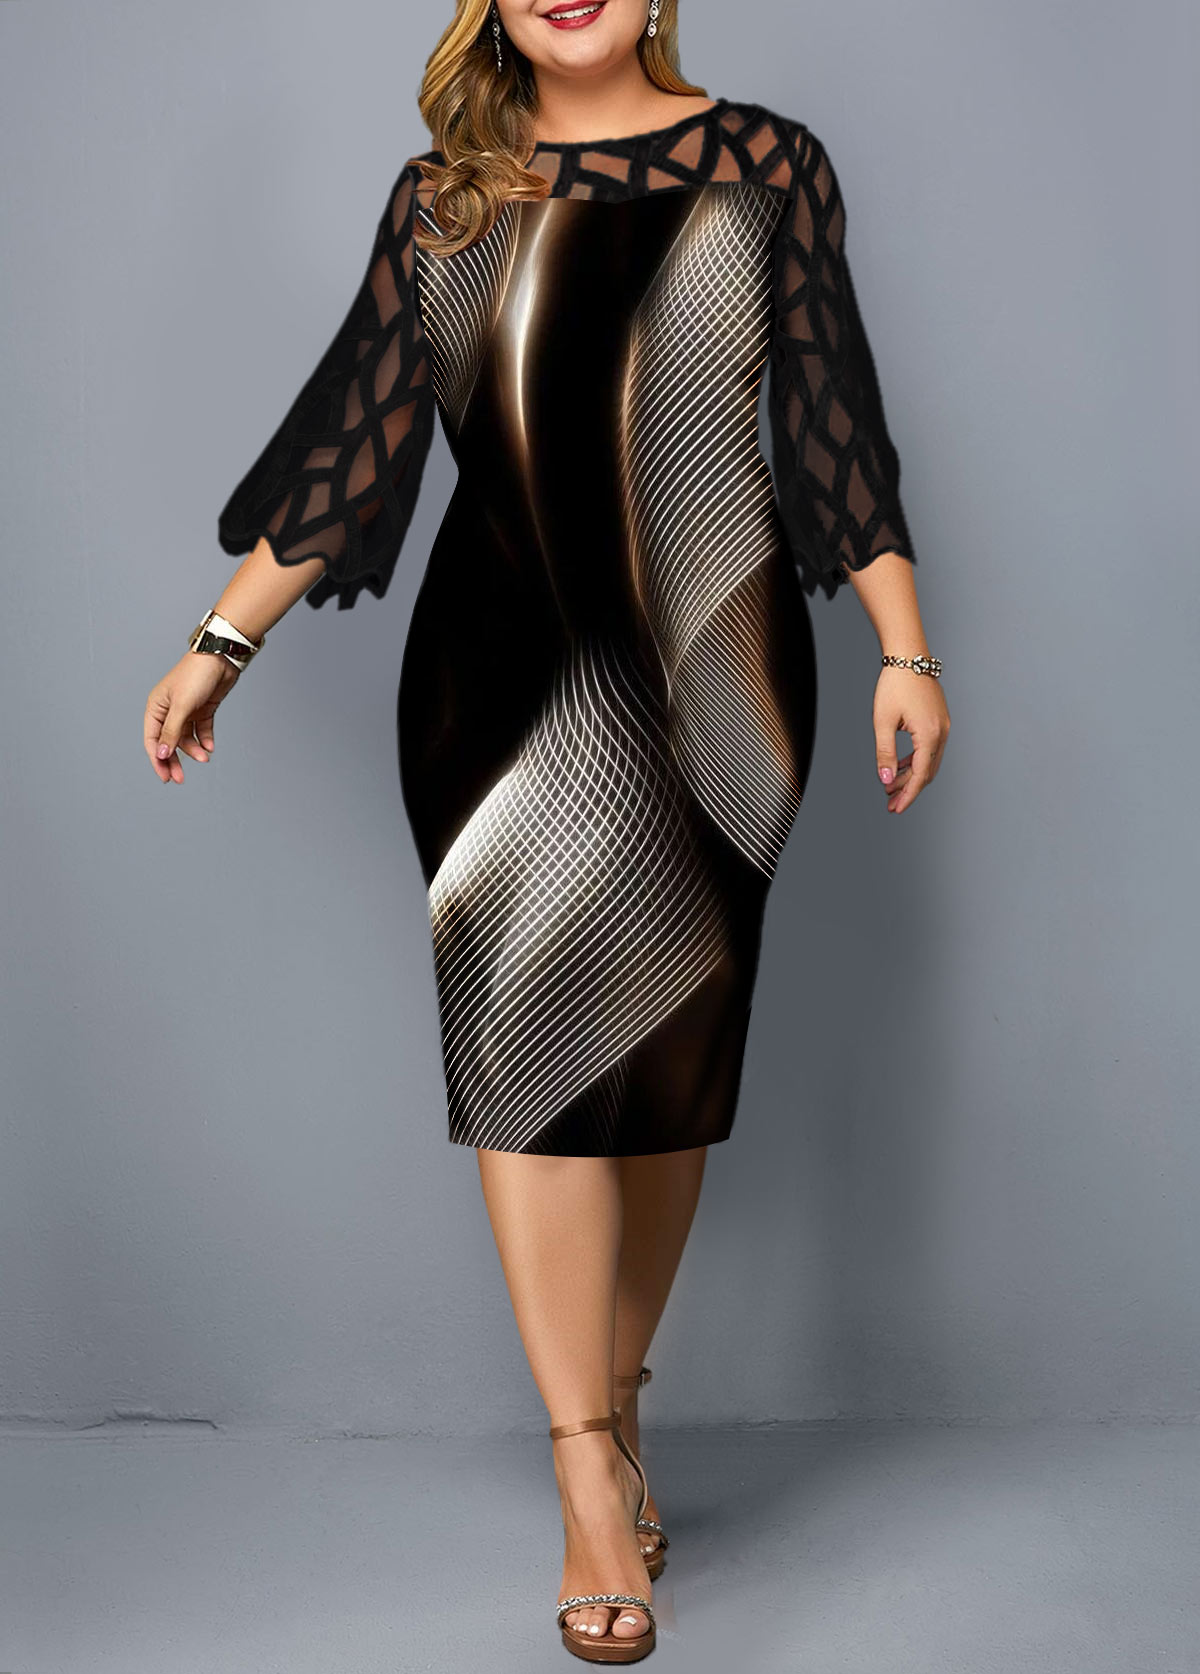 Lace Panel Geometric Print Plus Size Sheath Dress